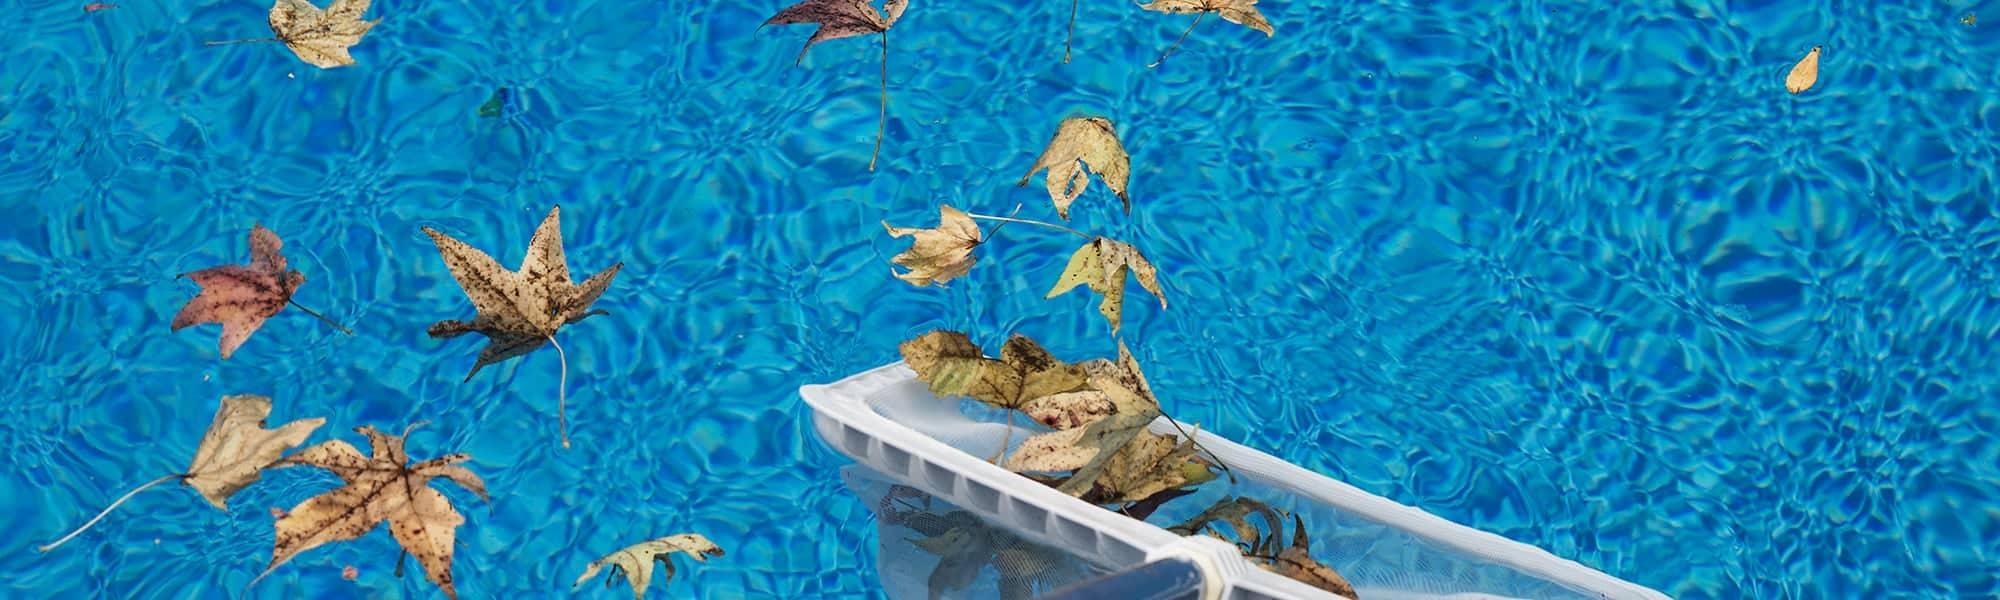 Nettoyer la surface de sa piscine